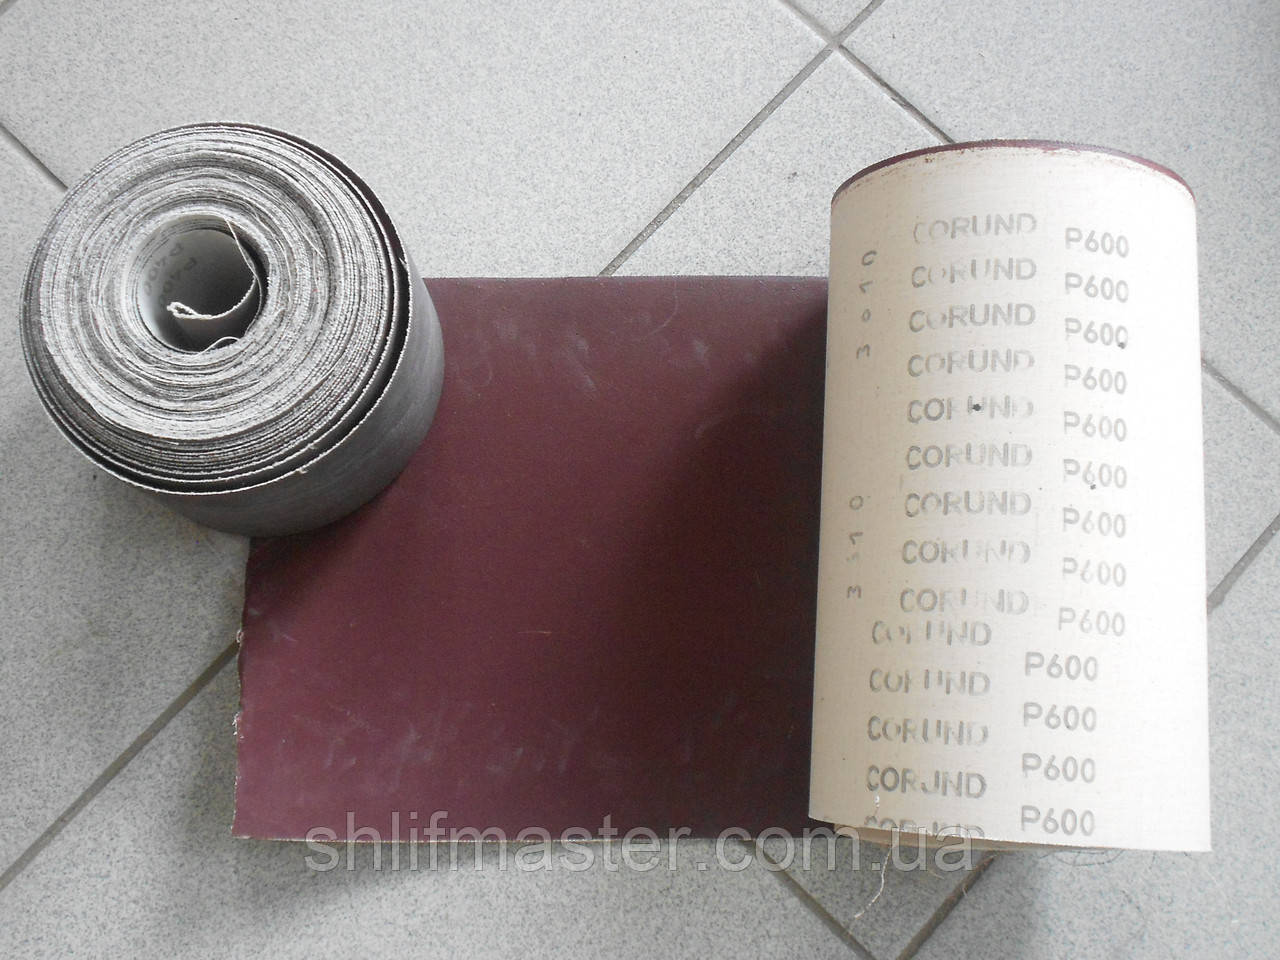 Шкурка шлифовальная ЗАК электрокорунд Р600 на основе особо гибкой х/б ткани 250 мм